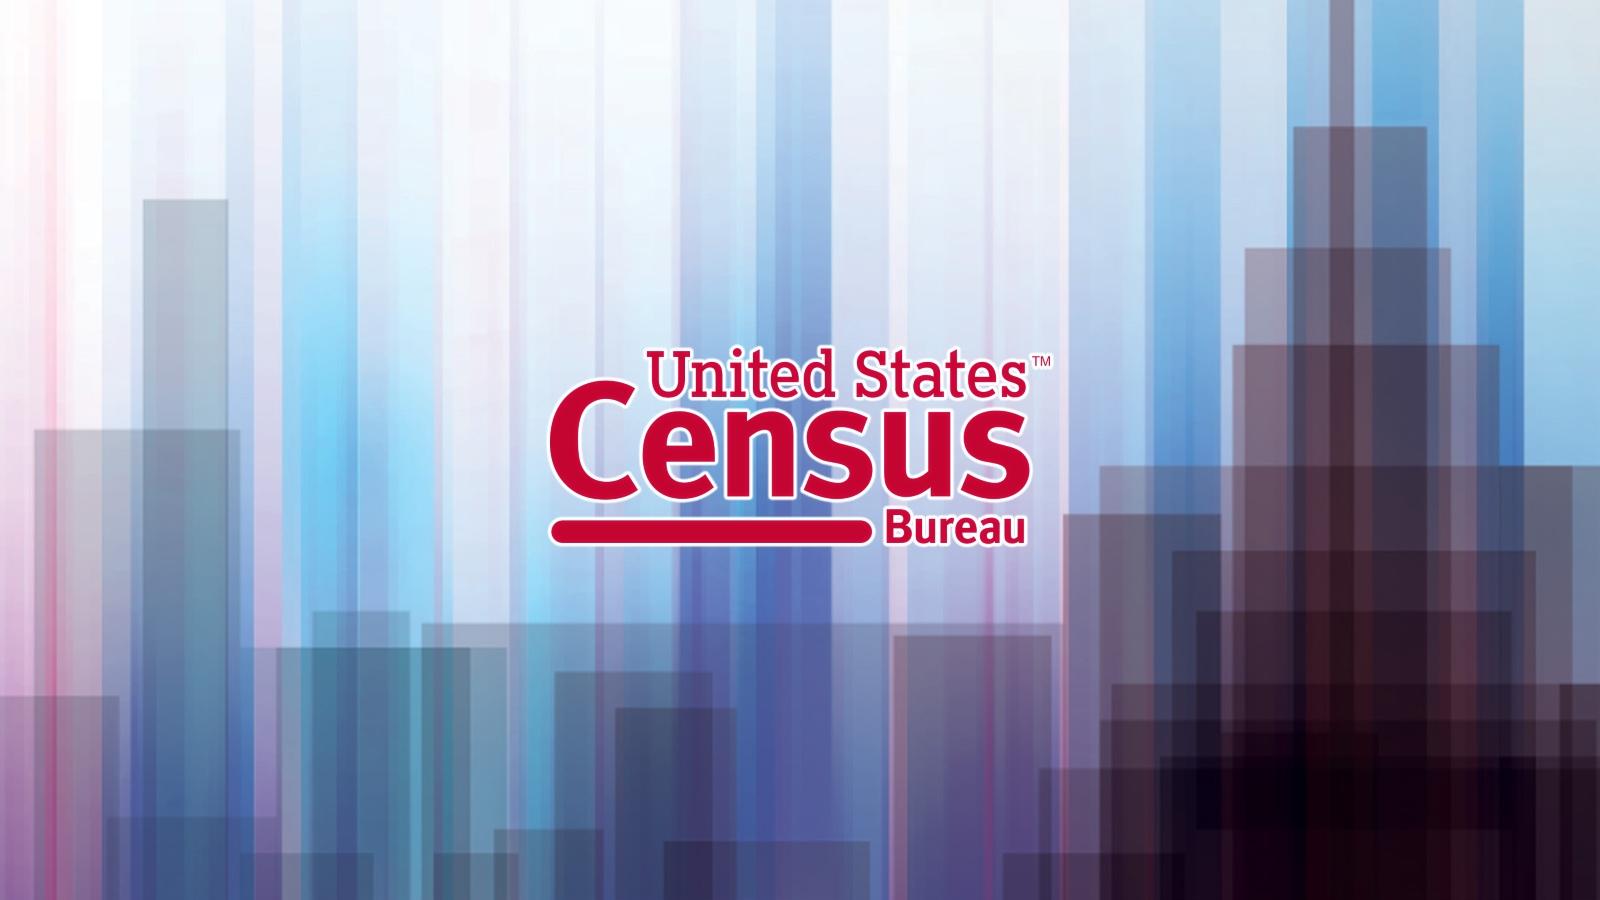 US Census Bureau hacked in January 2020 using Citrix exploit